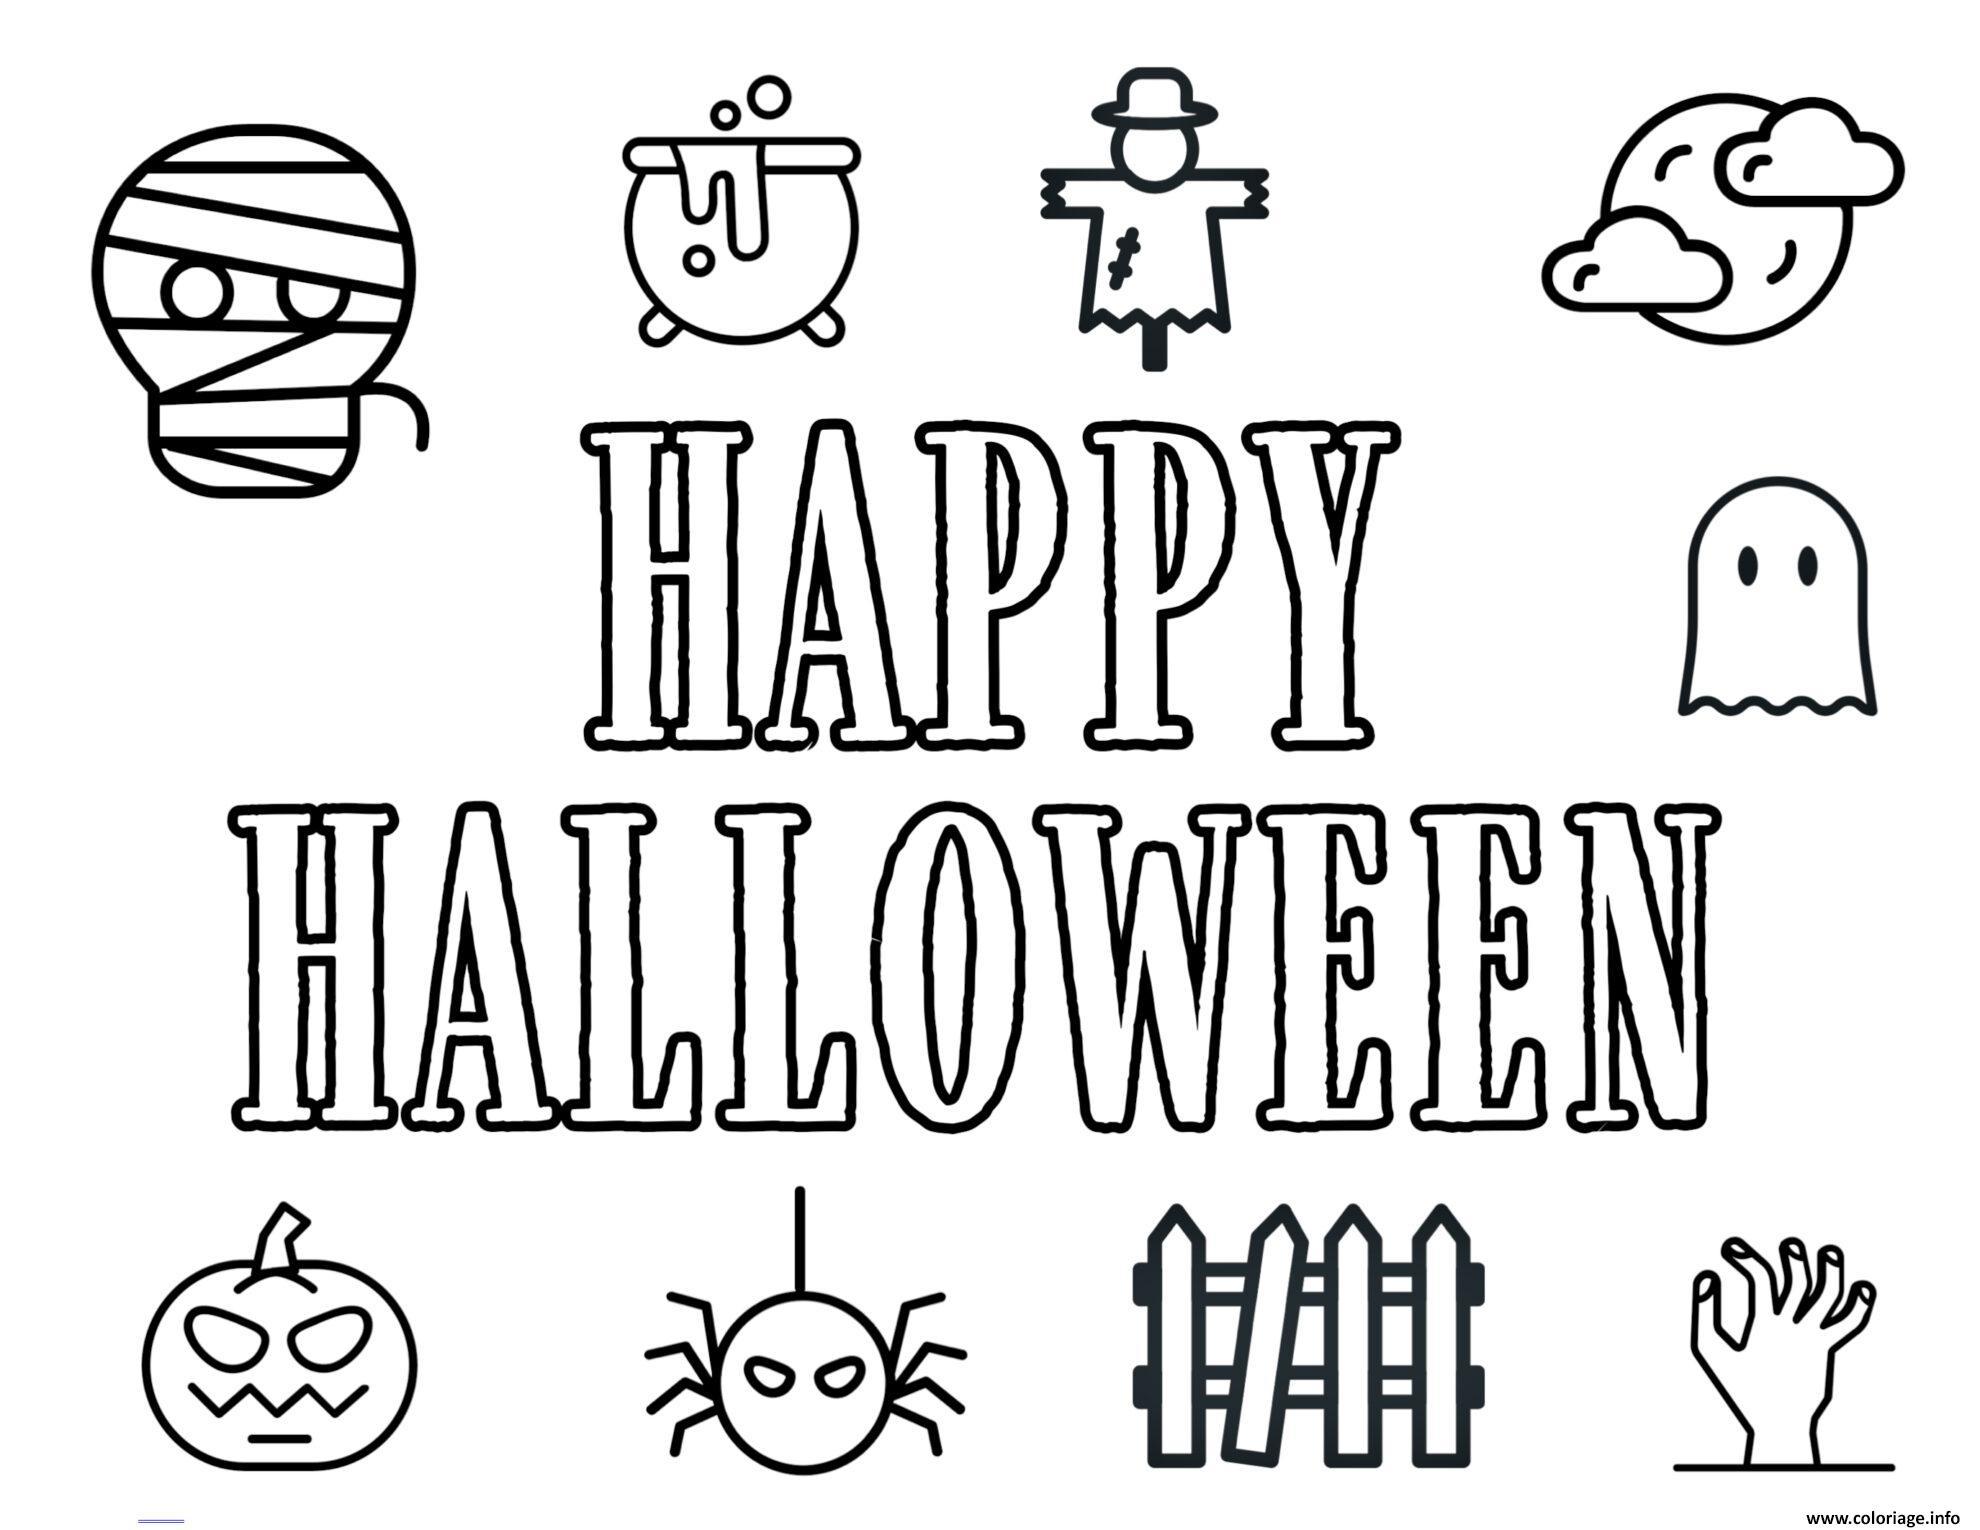 Dessin Joyeux Halloween.Coloriage Happy Halloween Icons Funs Dessin Halloween A Imprimer